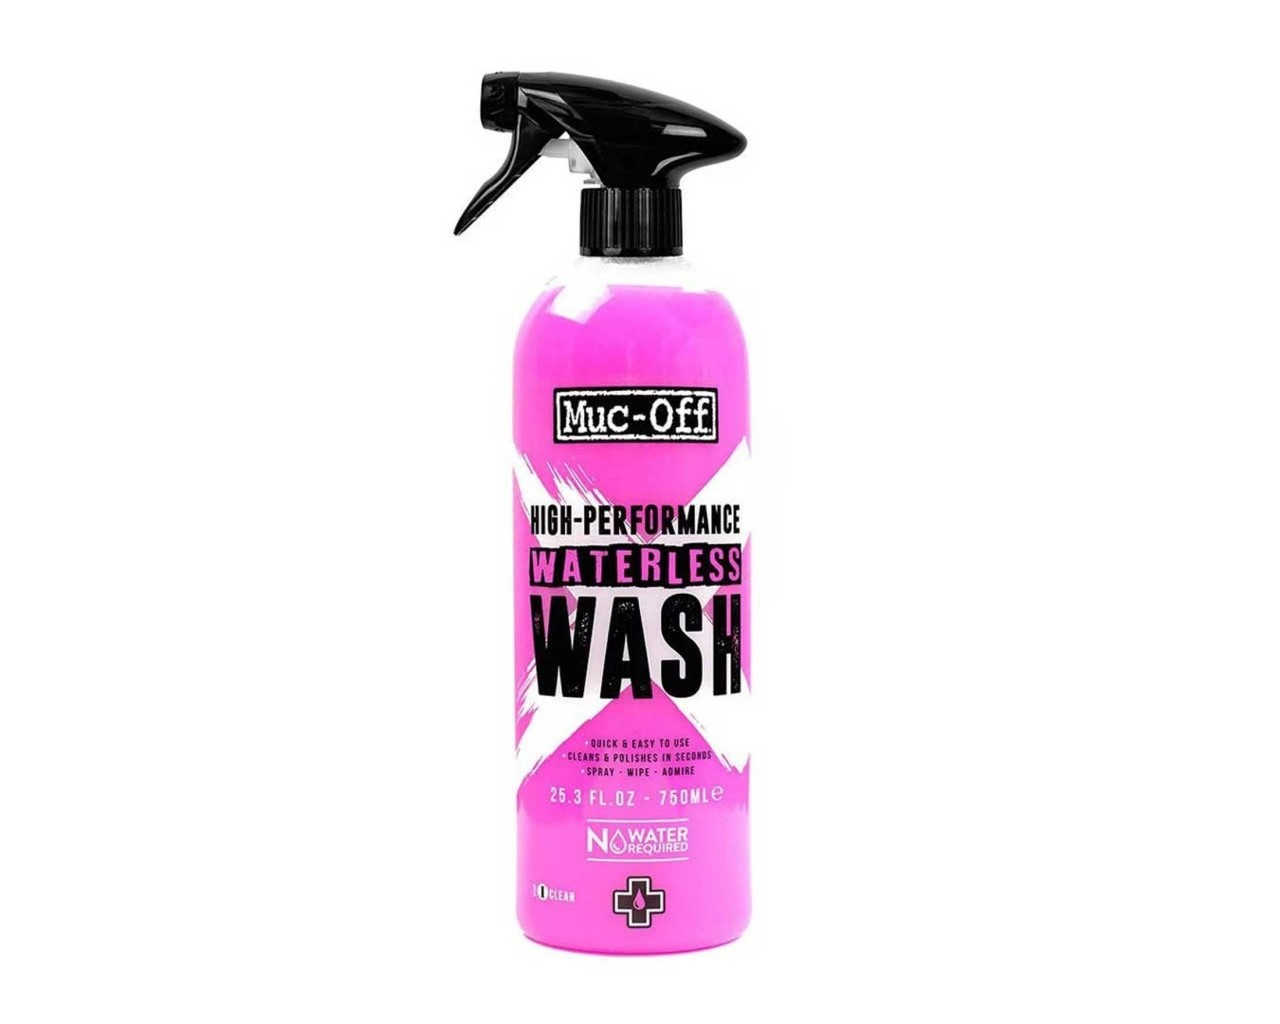 Muc-Off High Performance Waterless Wash 750 ml